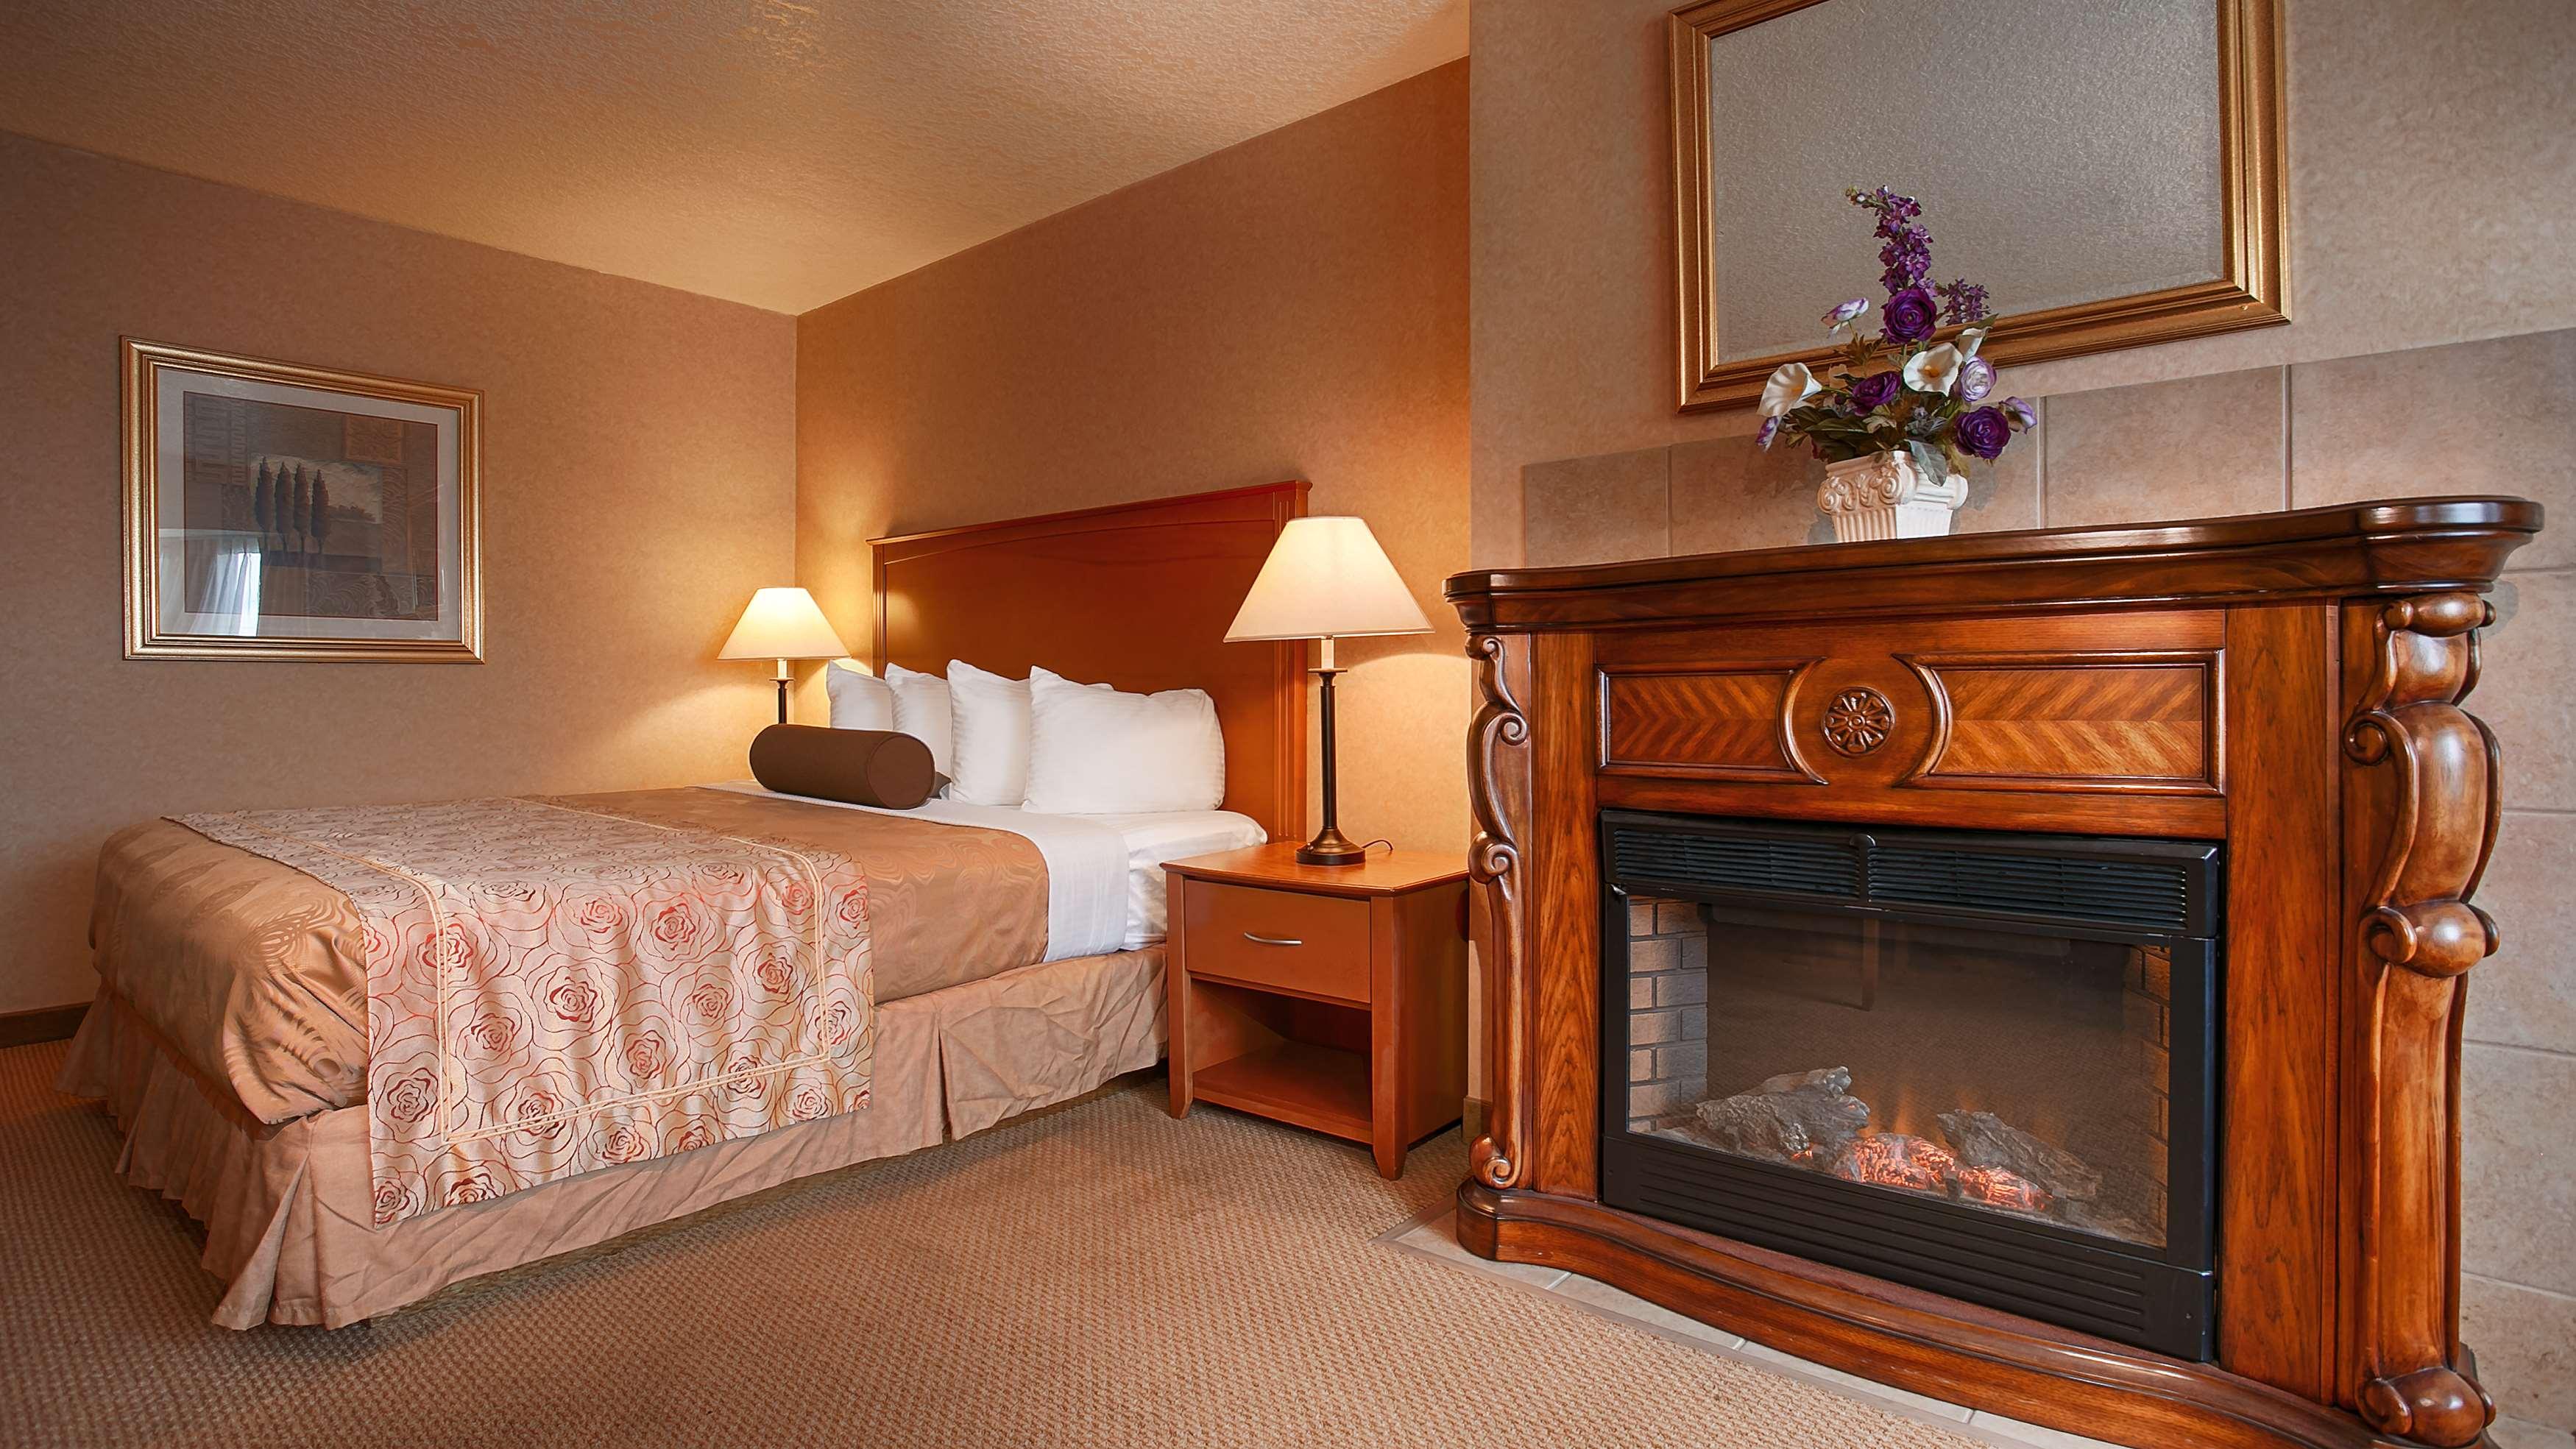 Best Western Plus Placerville Inn image 7